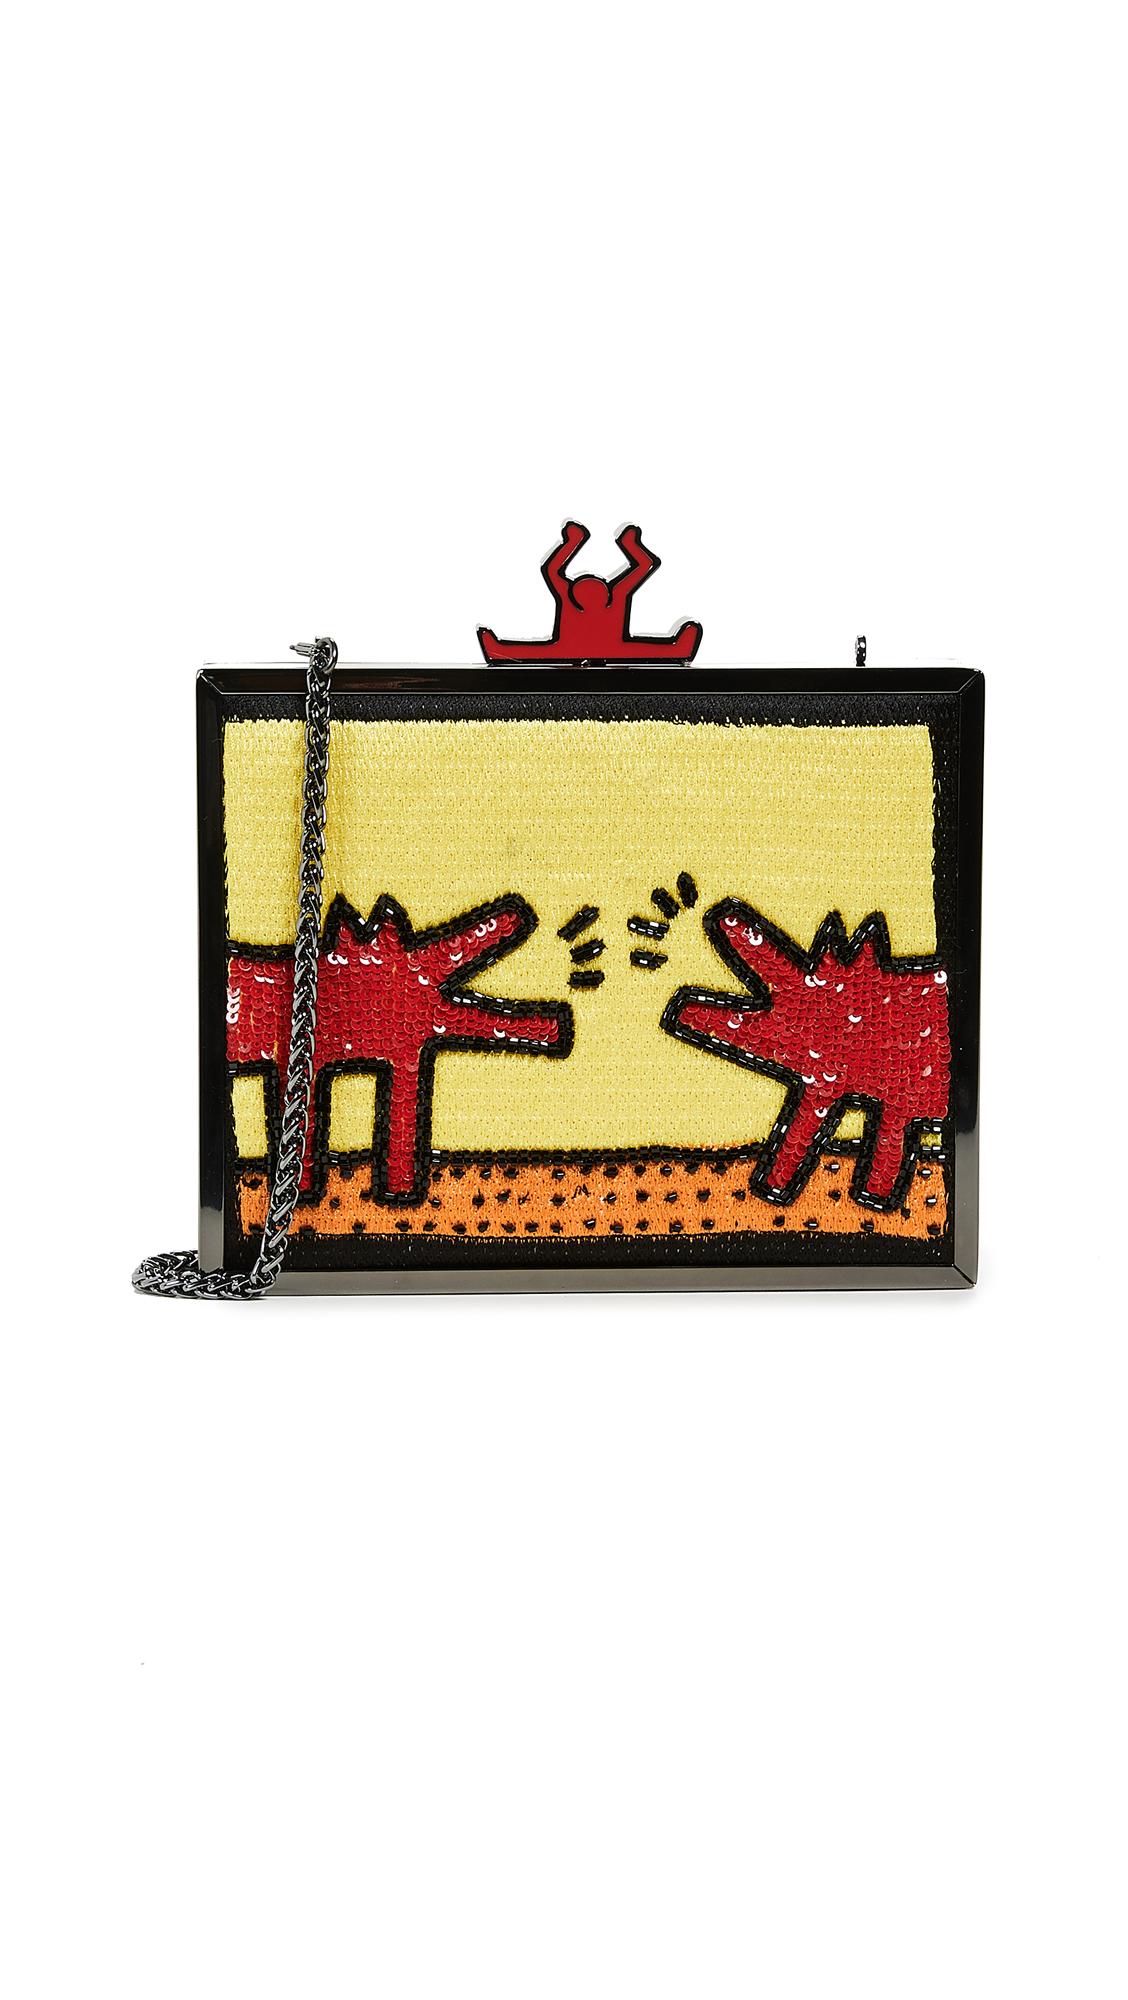 alice + olivia x Keith Haring Abbey Embellished Clutch - Barking Dog